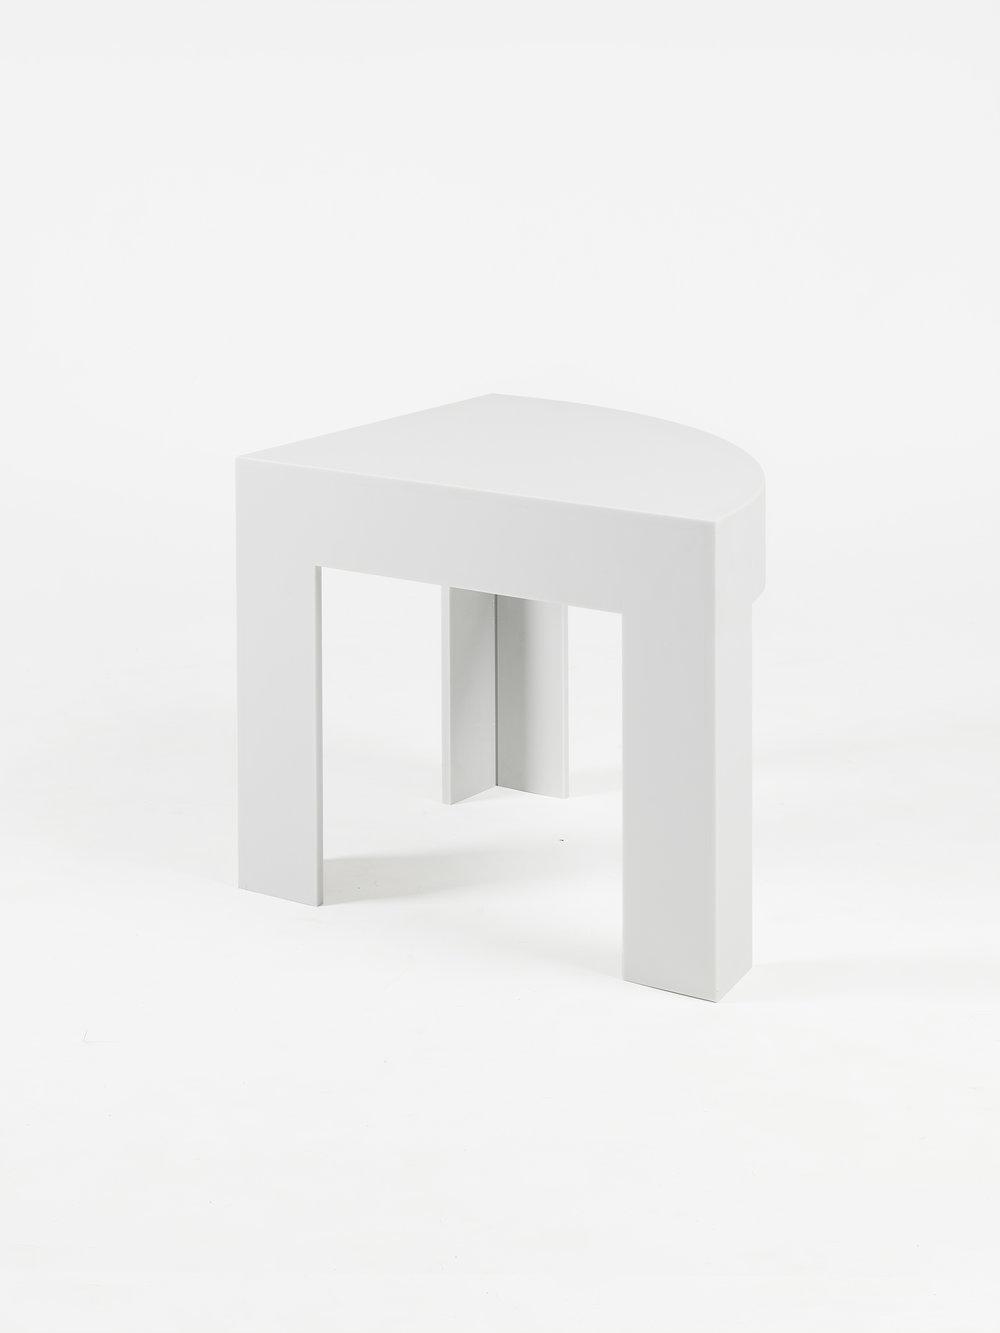 modules_vue11.jpg